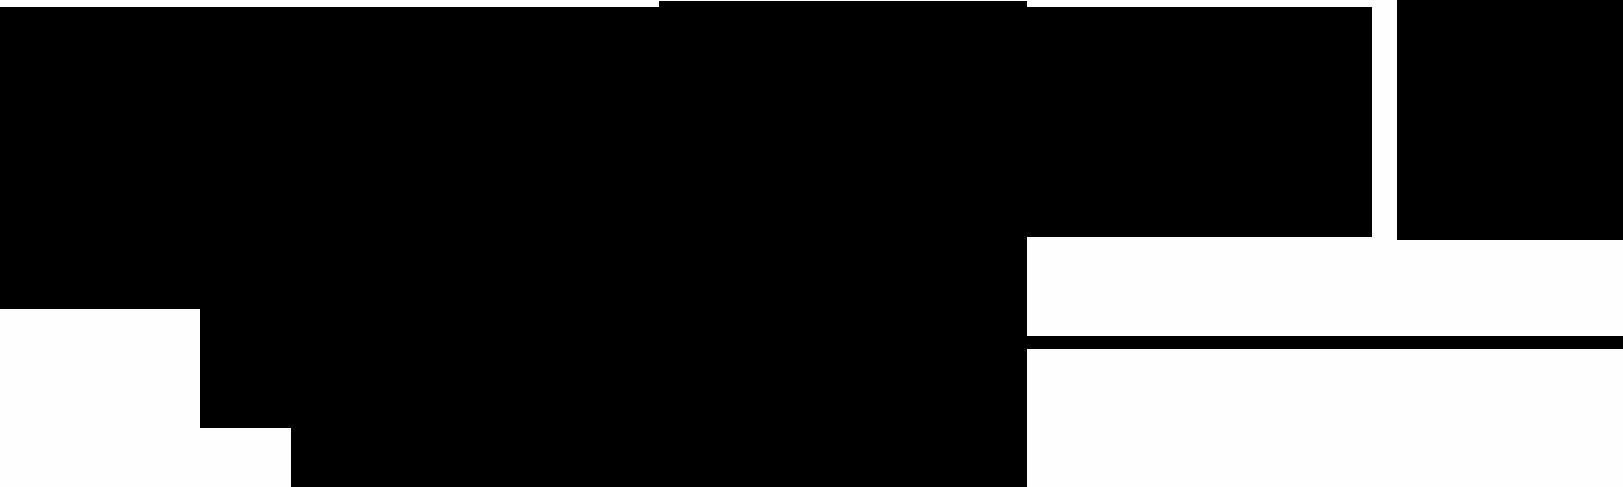 logo-OH_maestro073_zwart.png